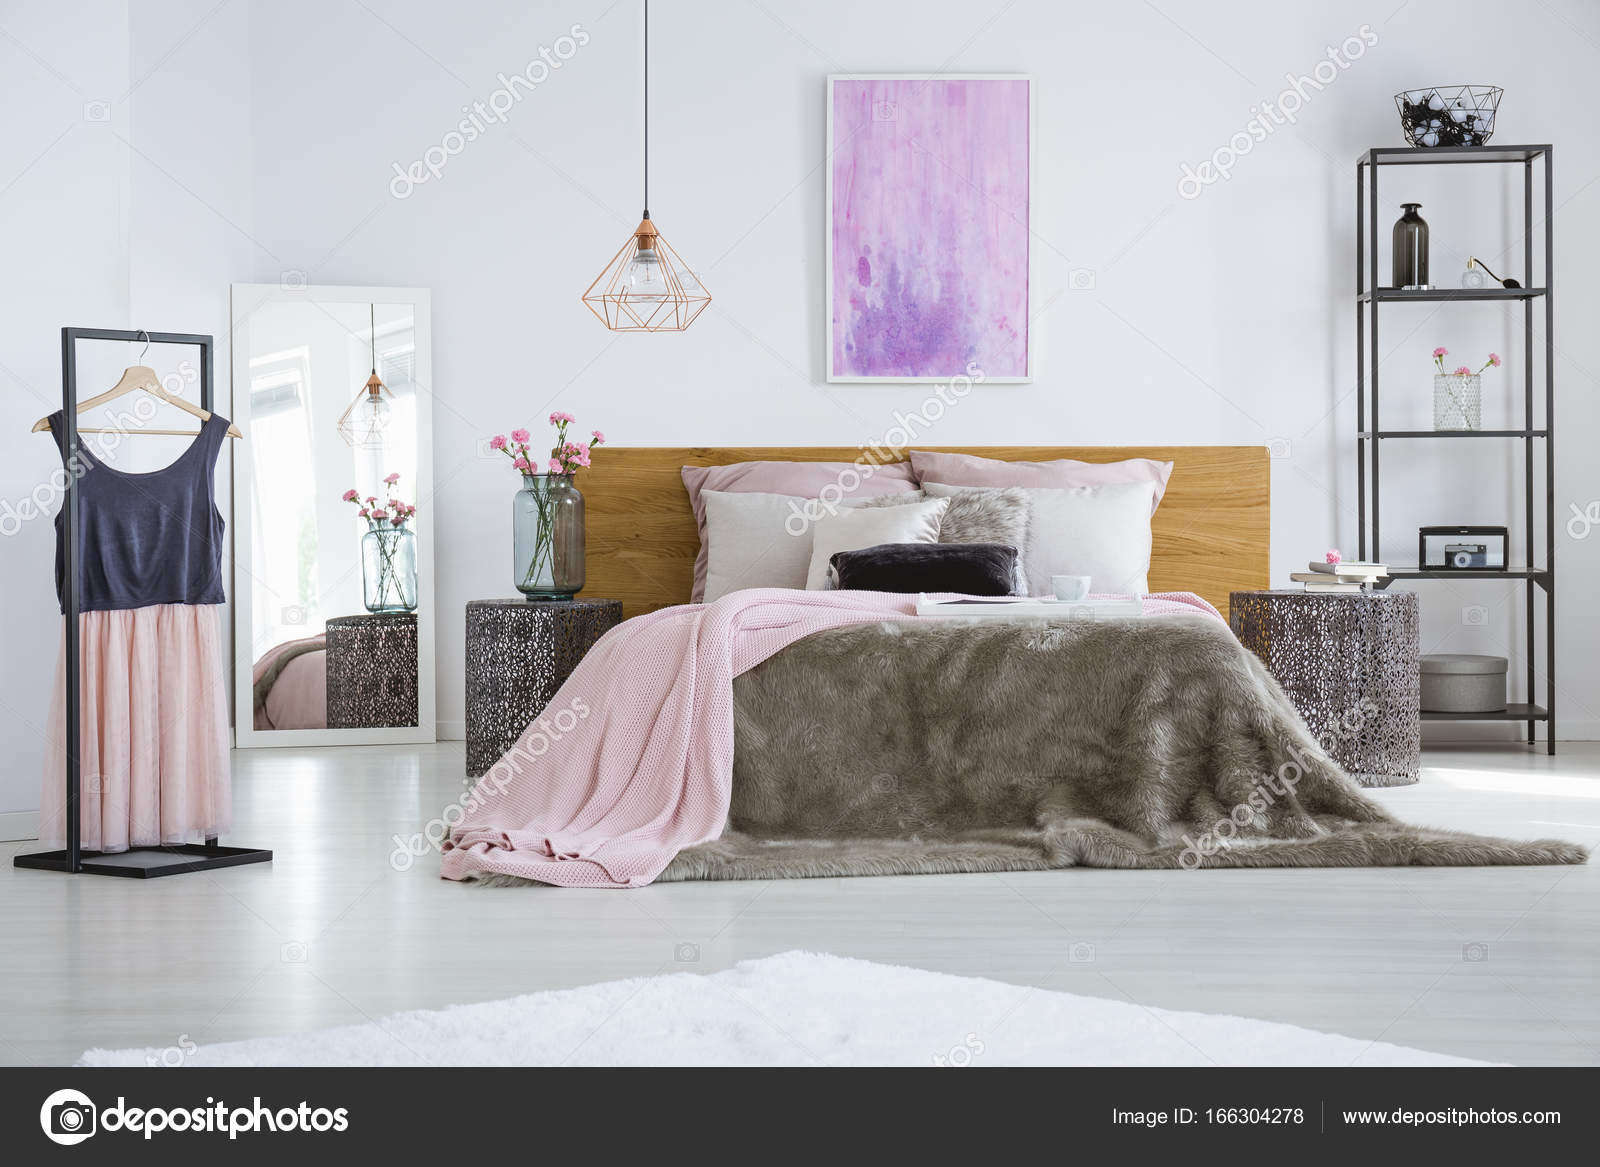 Industriële lamp in slaapkamer interieur — Stockfoto © photographee ...